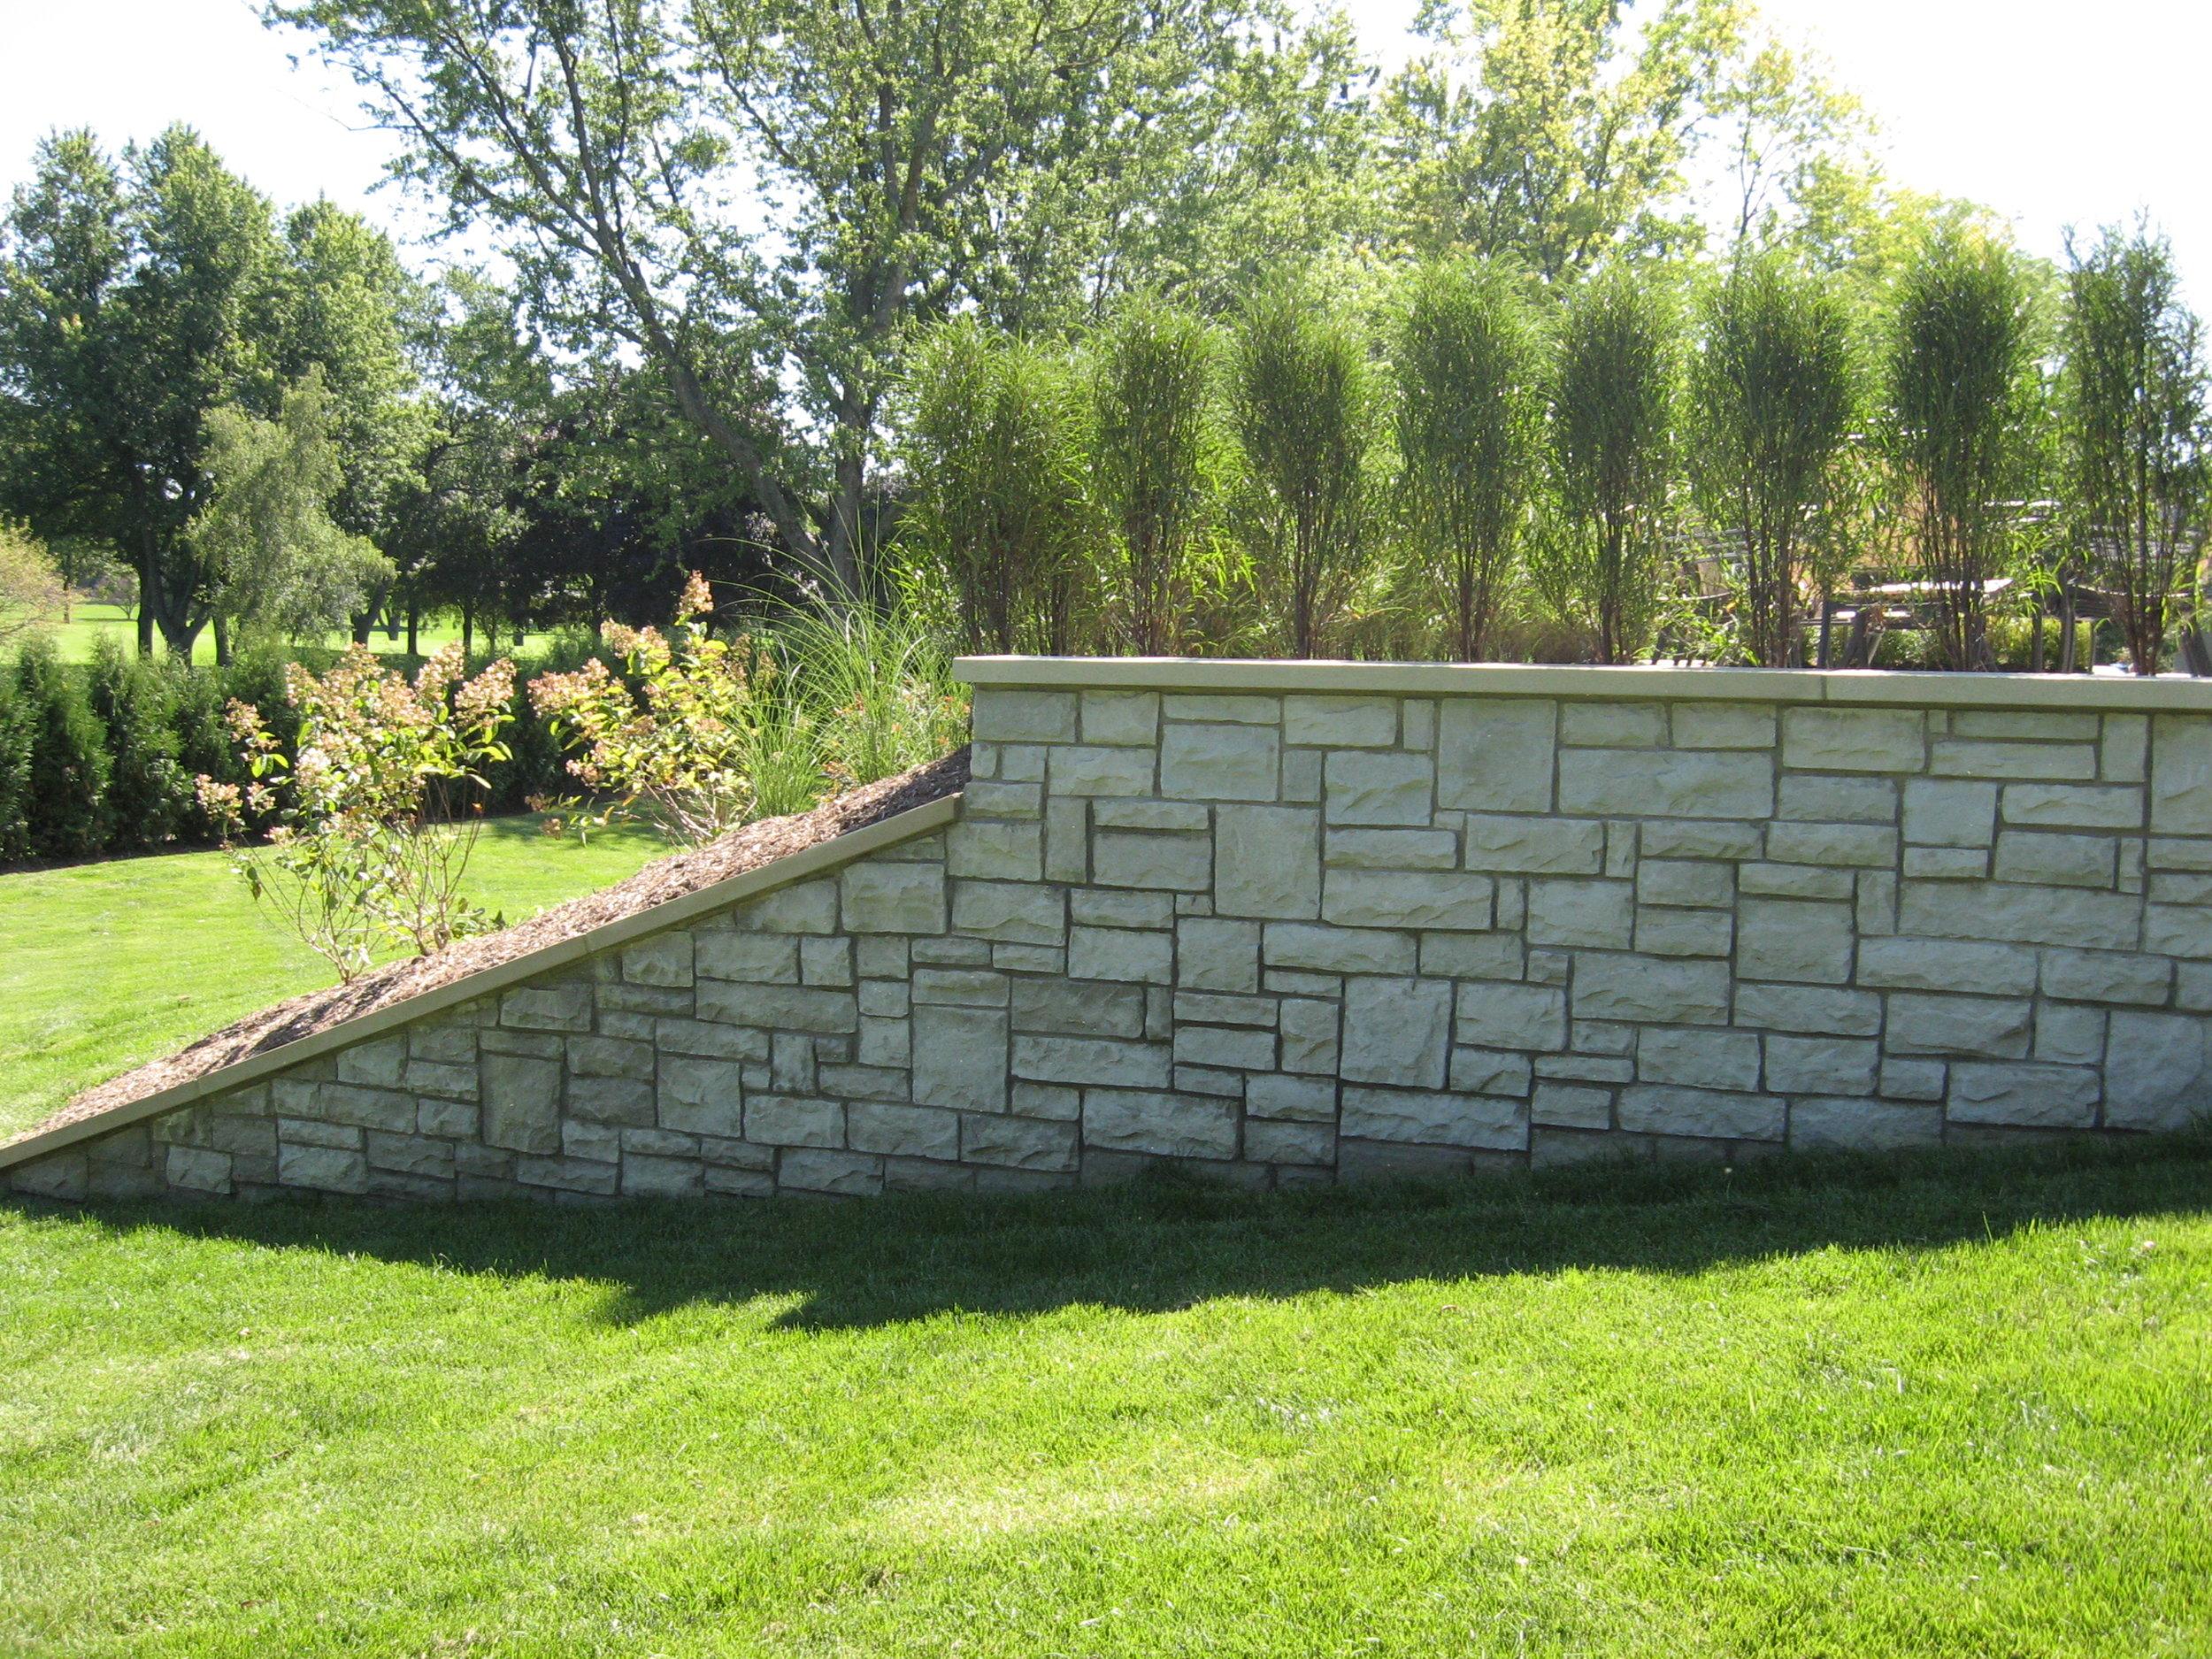 Brick path in Berkley, MI, Metro Detroit